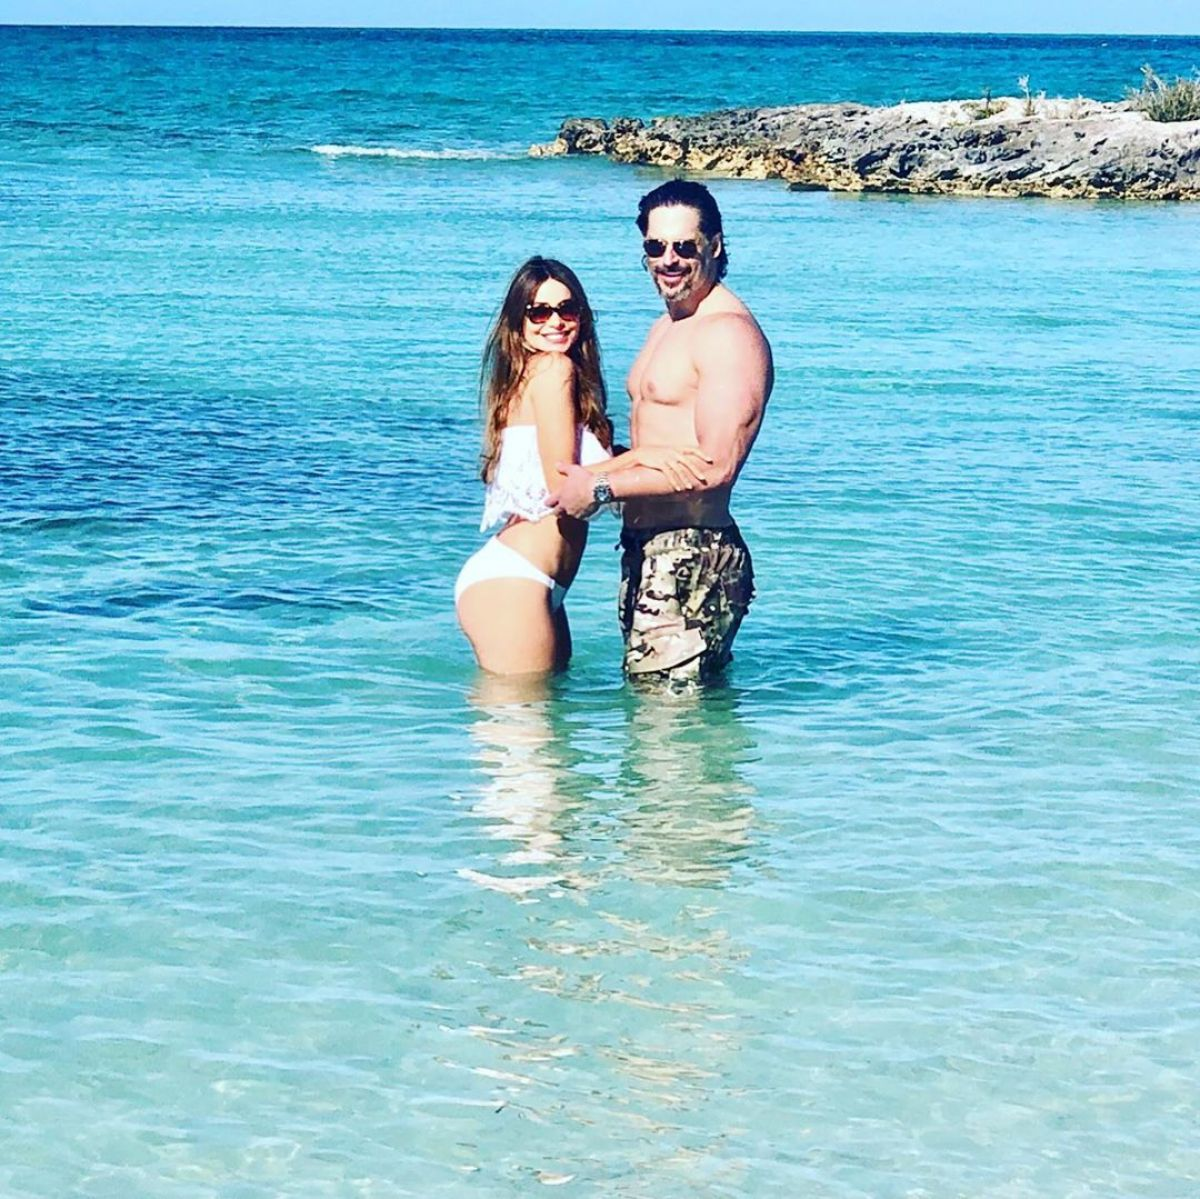 29f7ec652e342 SOFIA VERGARA in Bikini – Instagram Picture 12/30/2018 – HawtCelebs